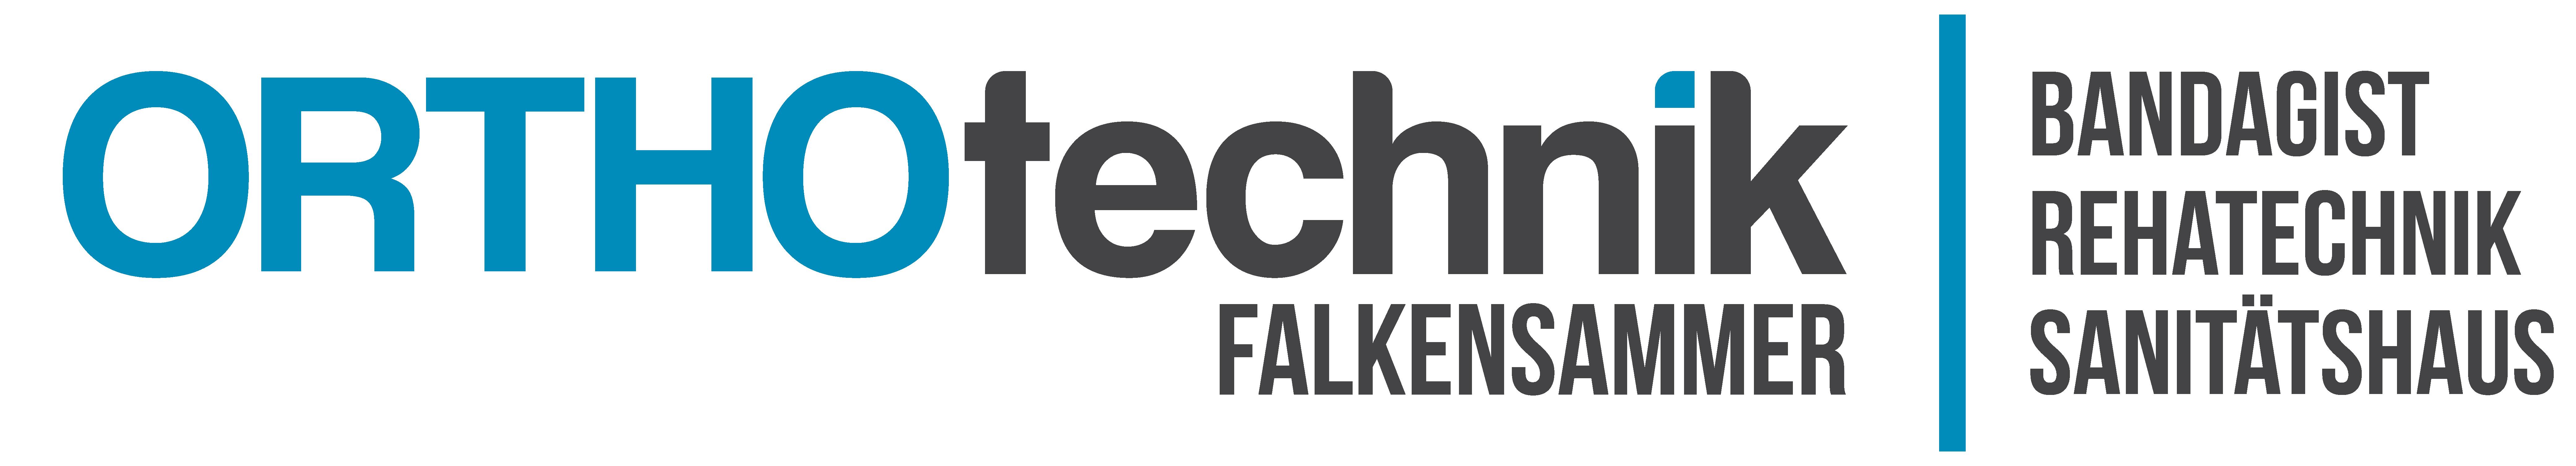 ORTHOtechnik_Logo